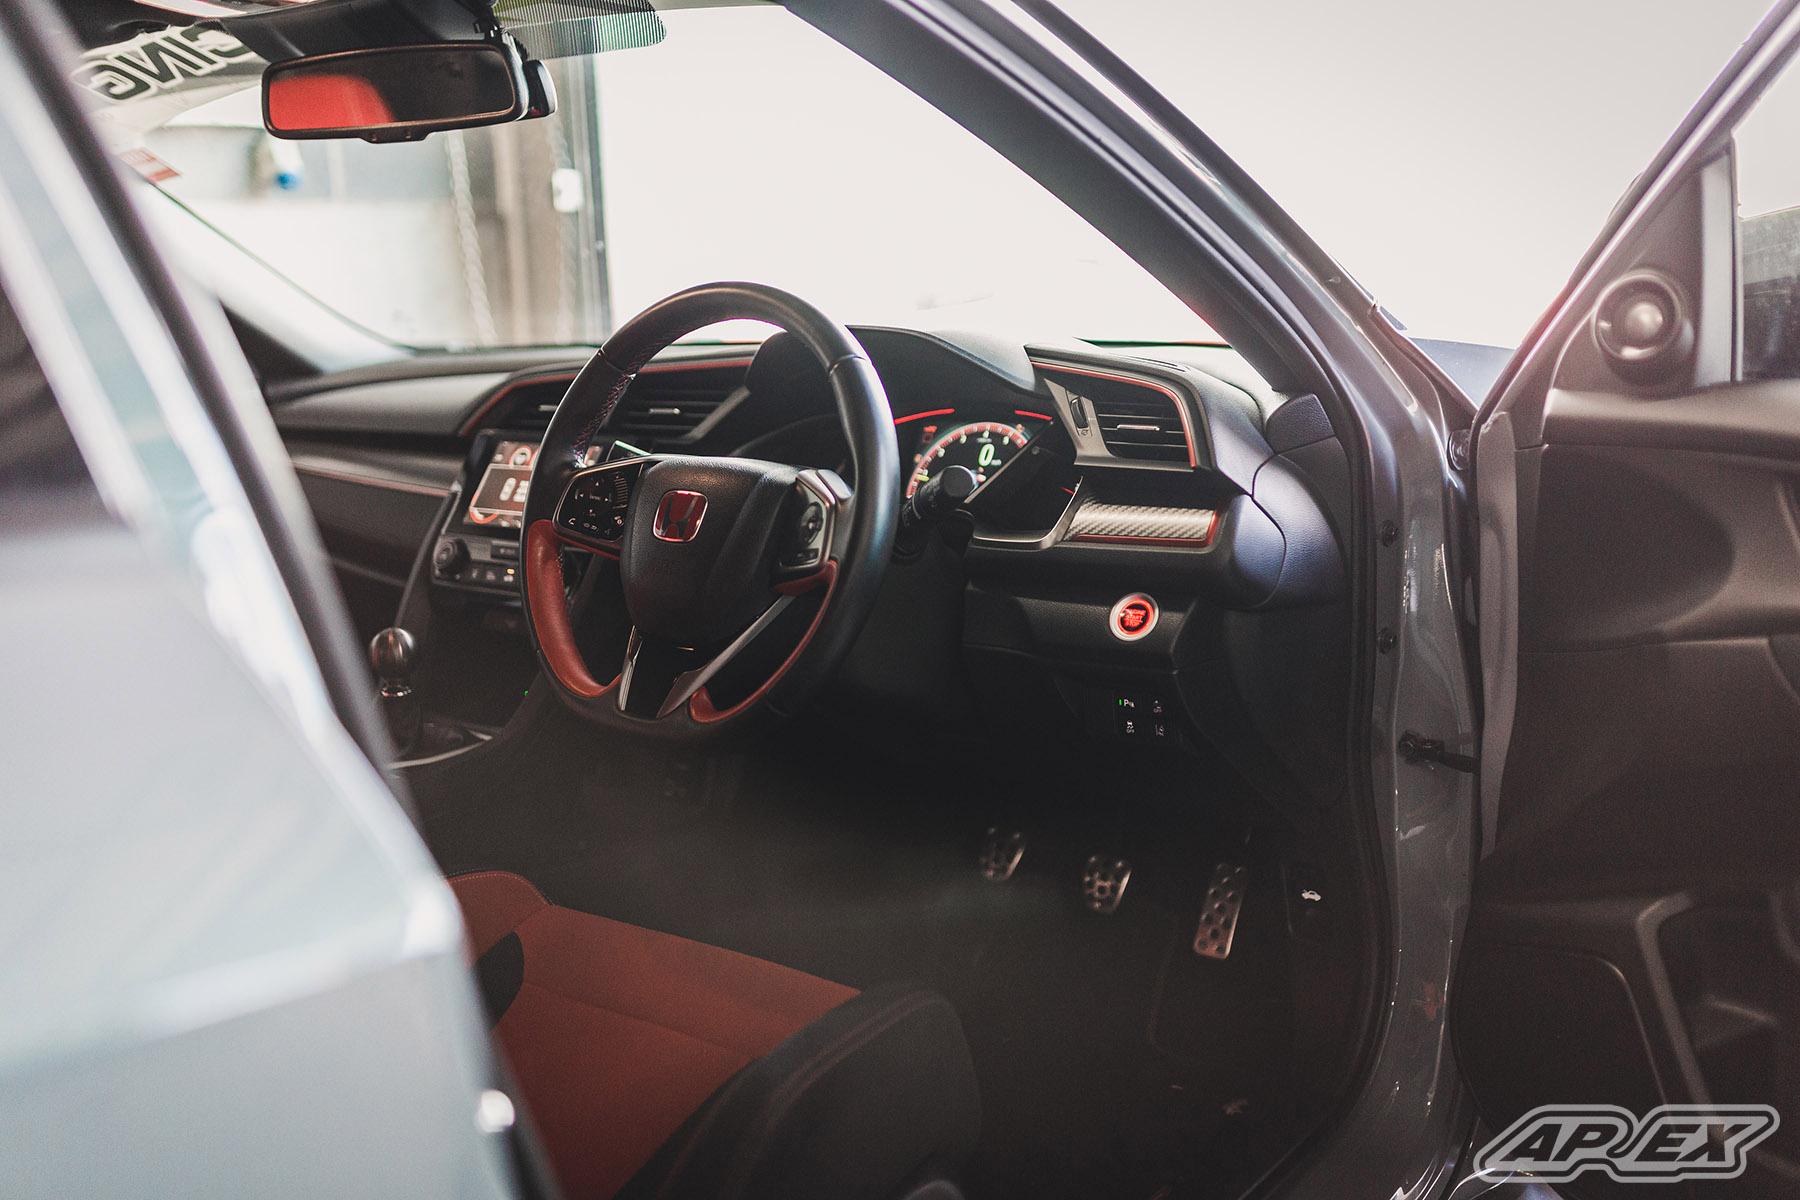 Honda Civic Type R on Lightweight APEX Wheels